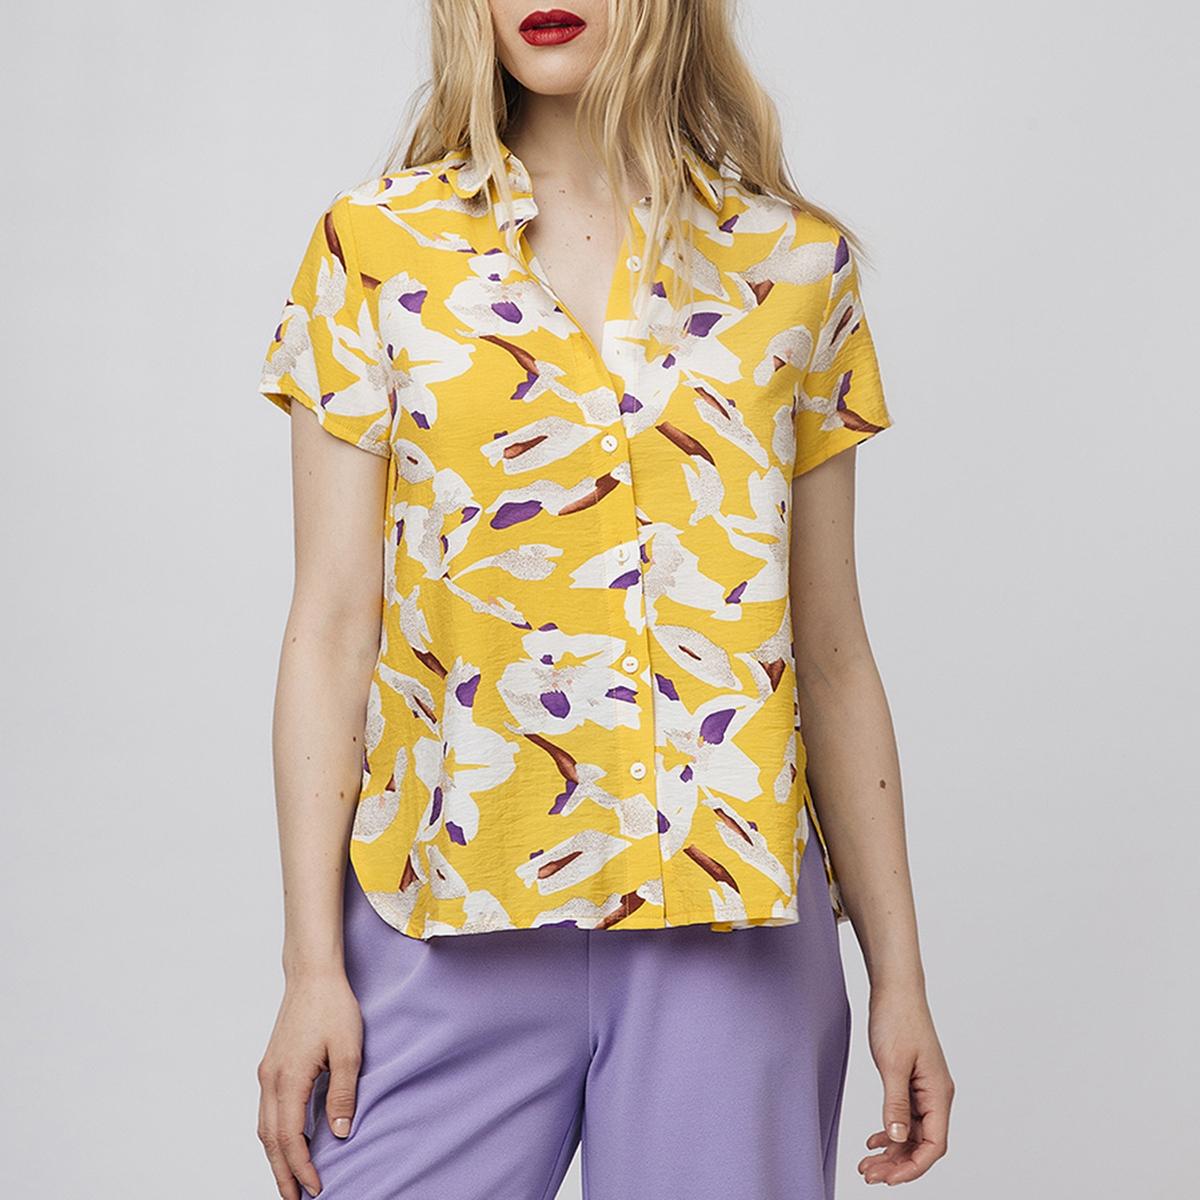 цена Блузка La Redoute С рисунком и короткими рукавами XL желтый онлайн в 2017 году